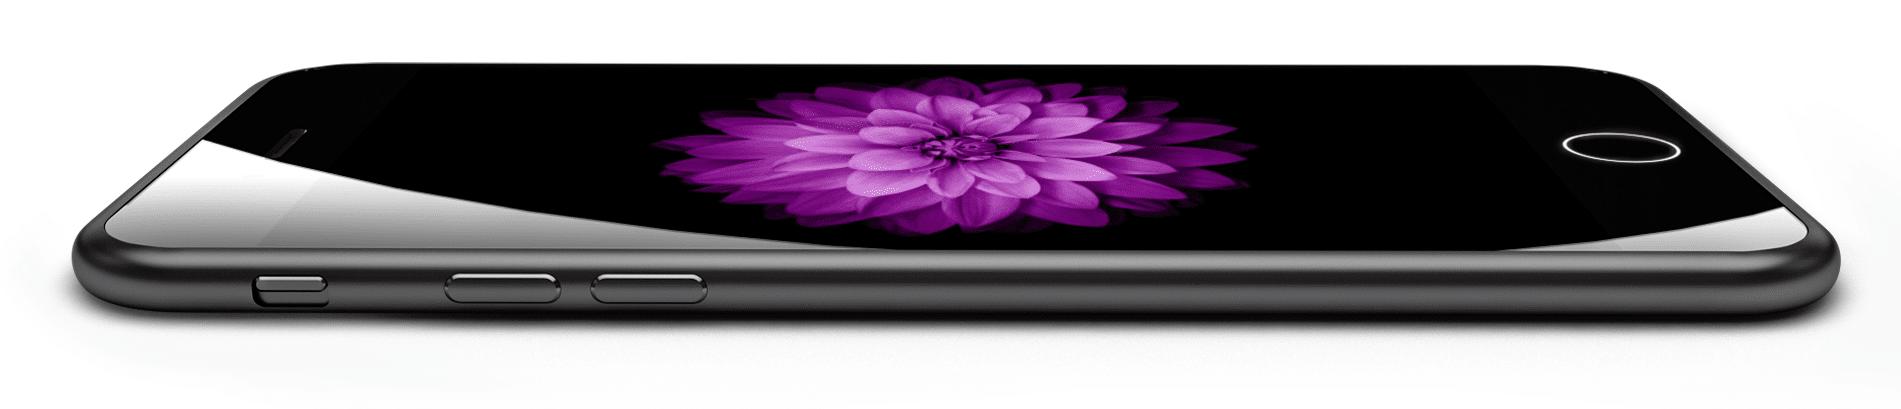 Smartphone Apple iPhone 7 Freebit cz